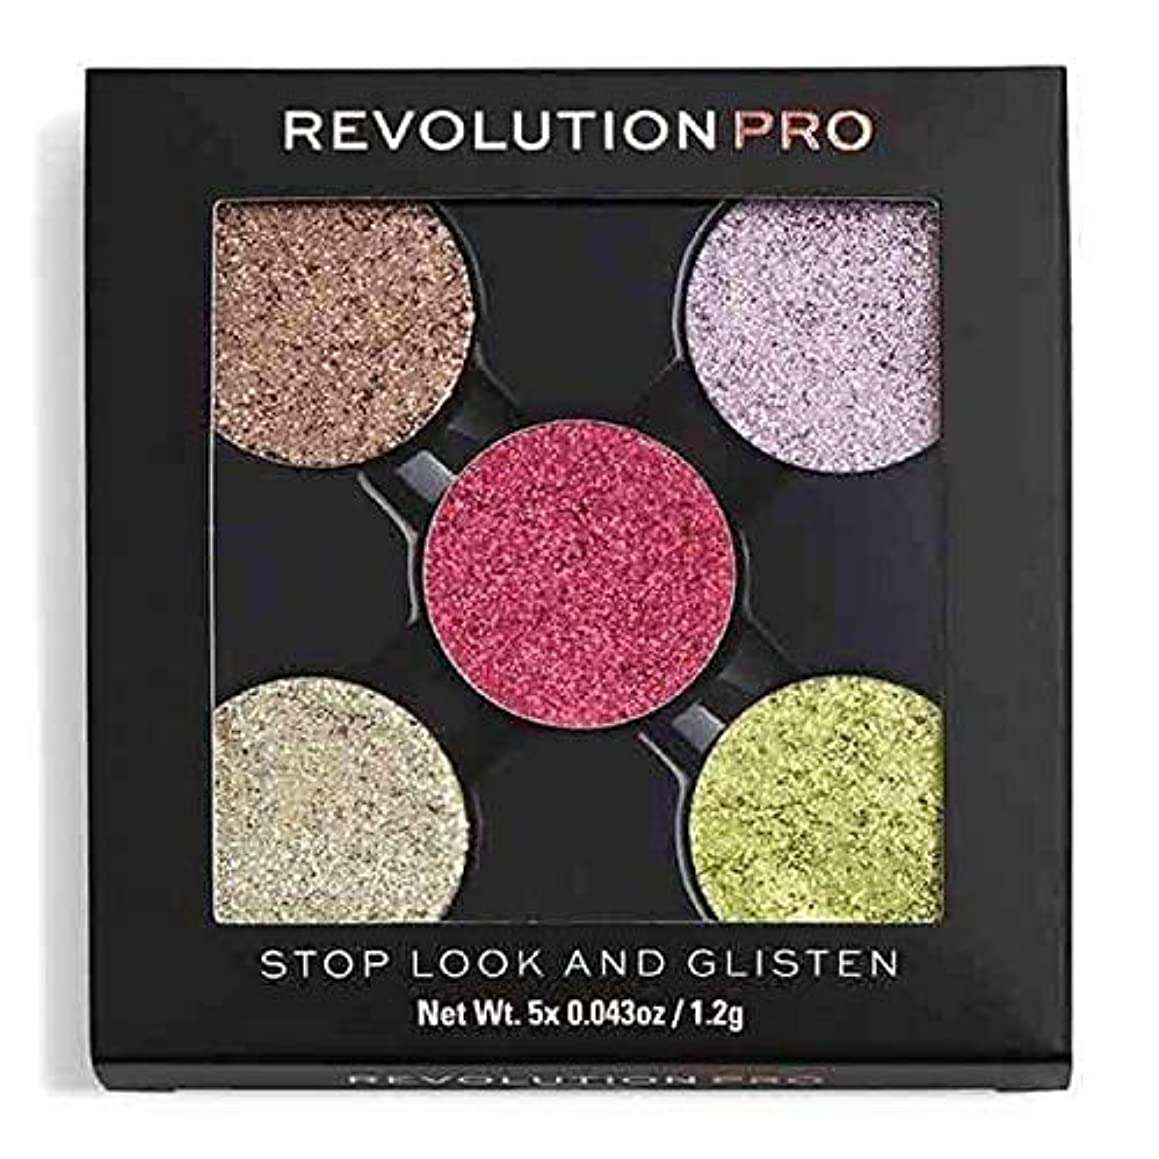 [Revolution ] 革命のプロが見て、光る、キラキラパックストップを押します - Revolution Pro Pressed Glitter Pack Stop, Look and Glisten [並行輸入品]